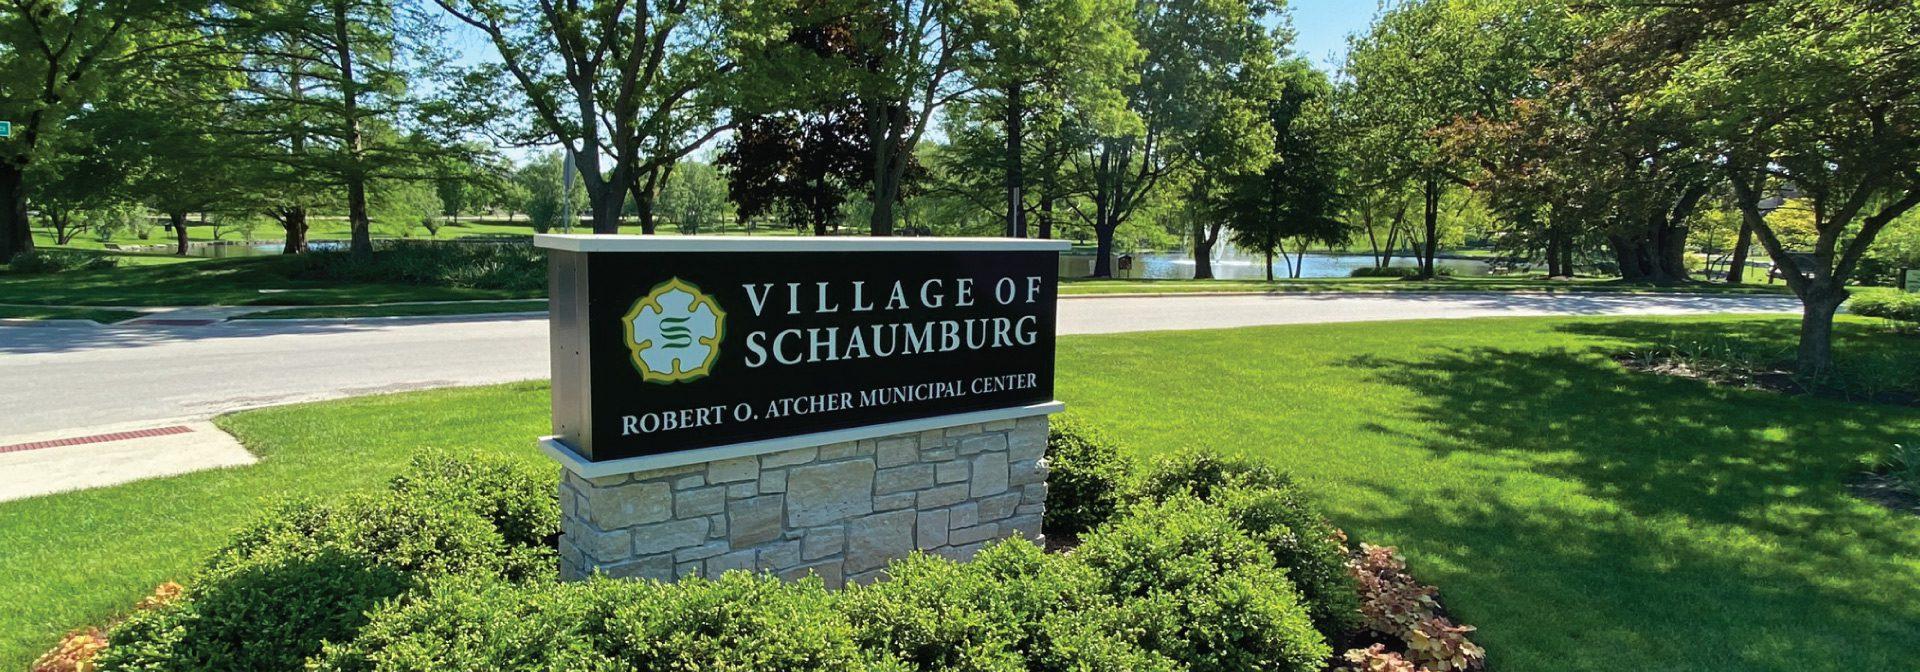 Schaumburg Limousine Services